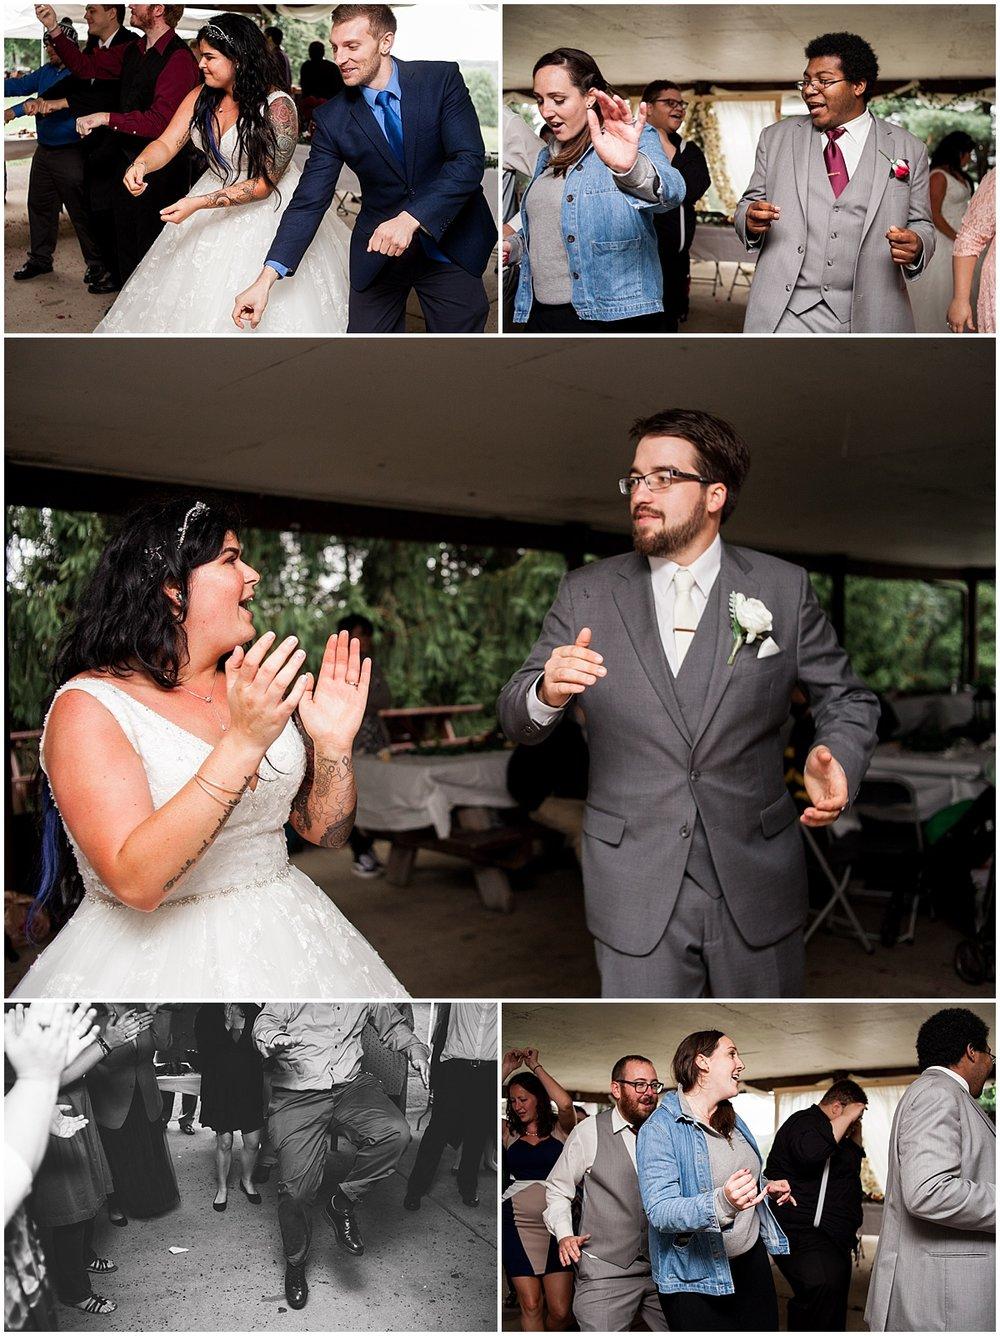 pittsburgh wedding reception dance photographer